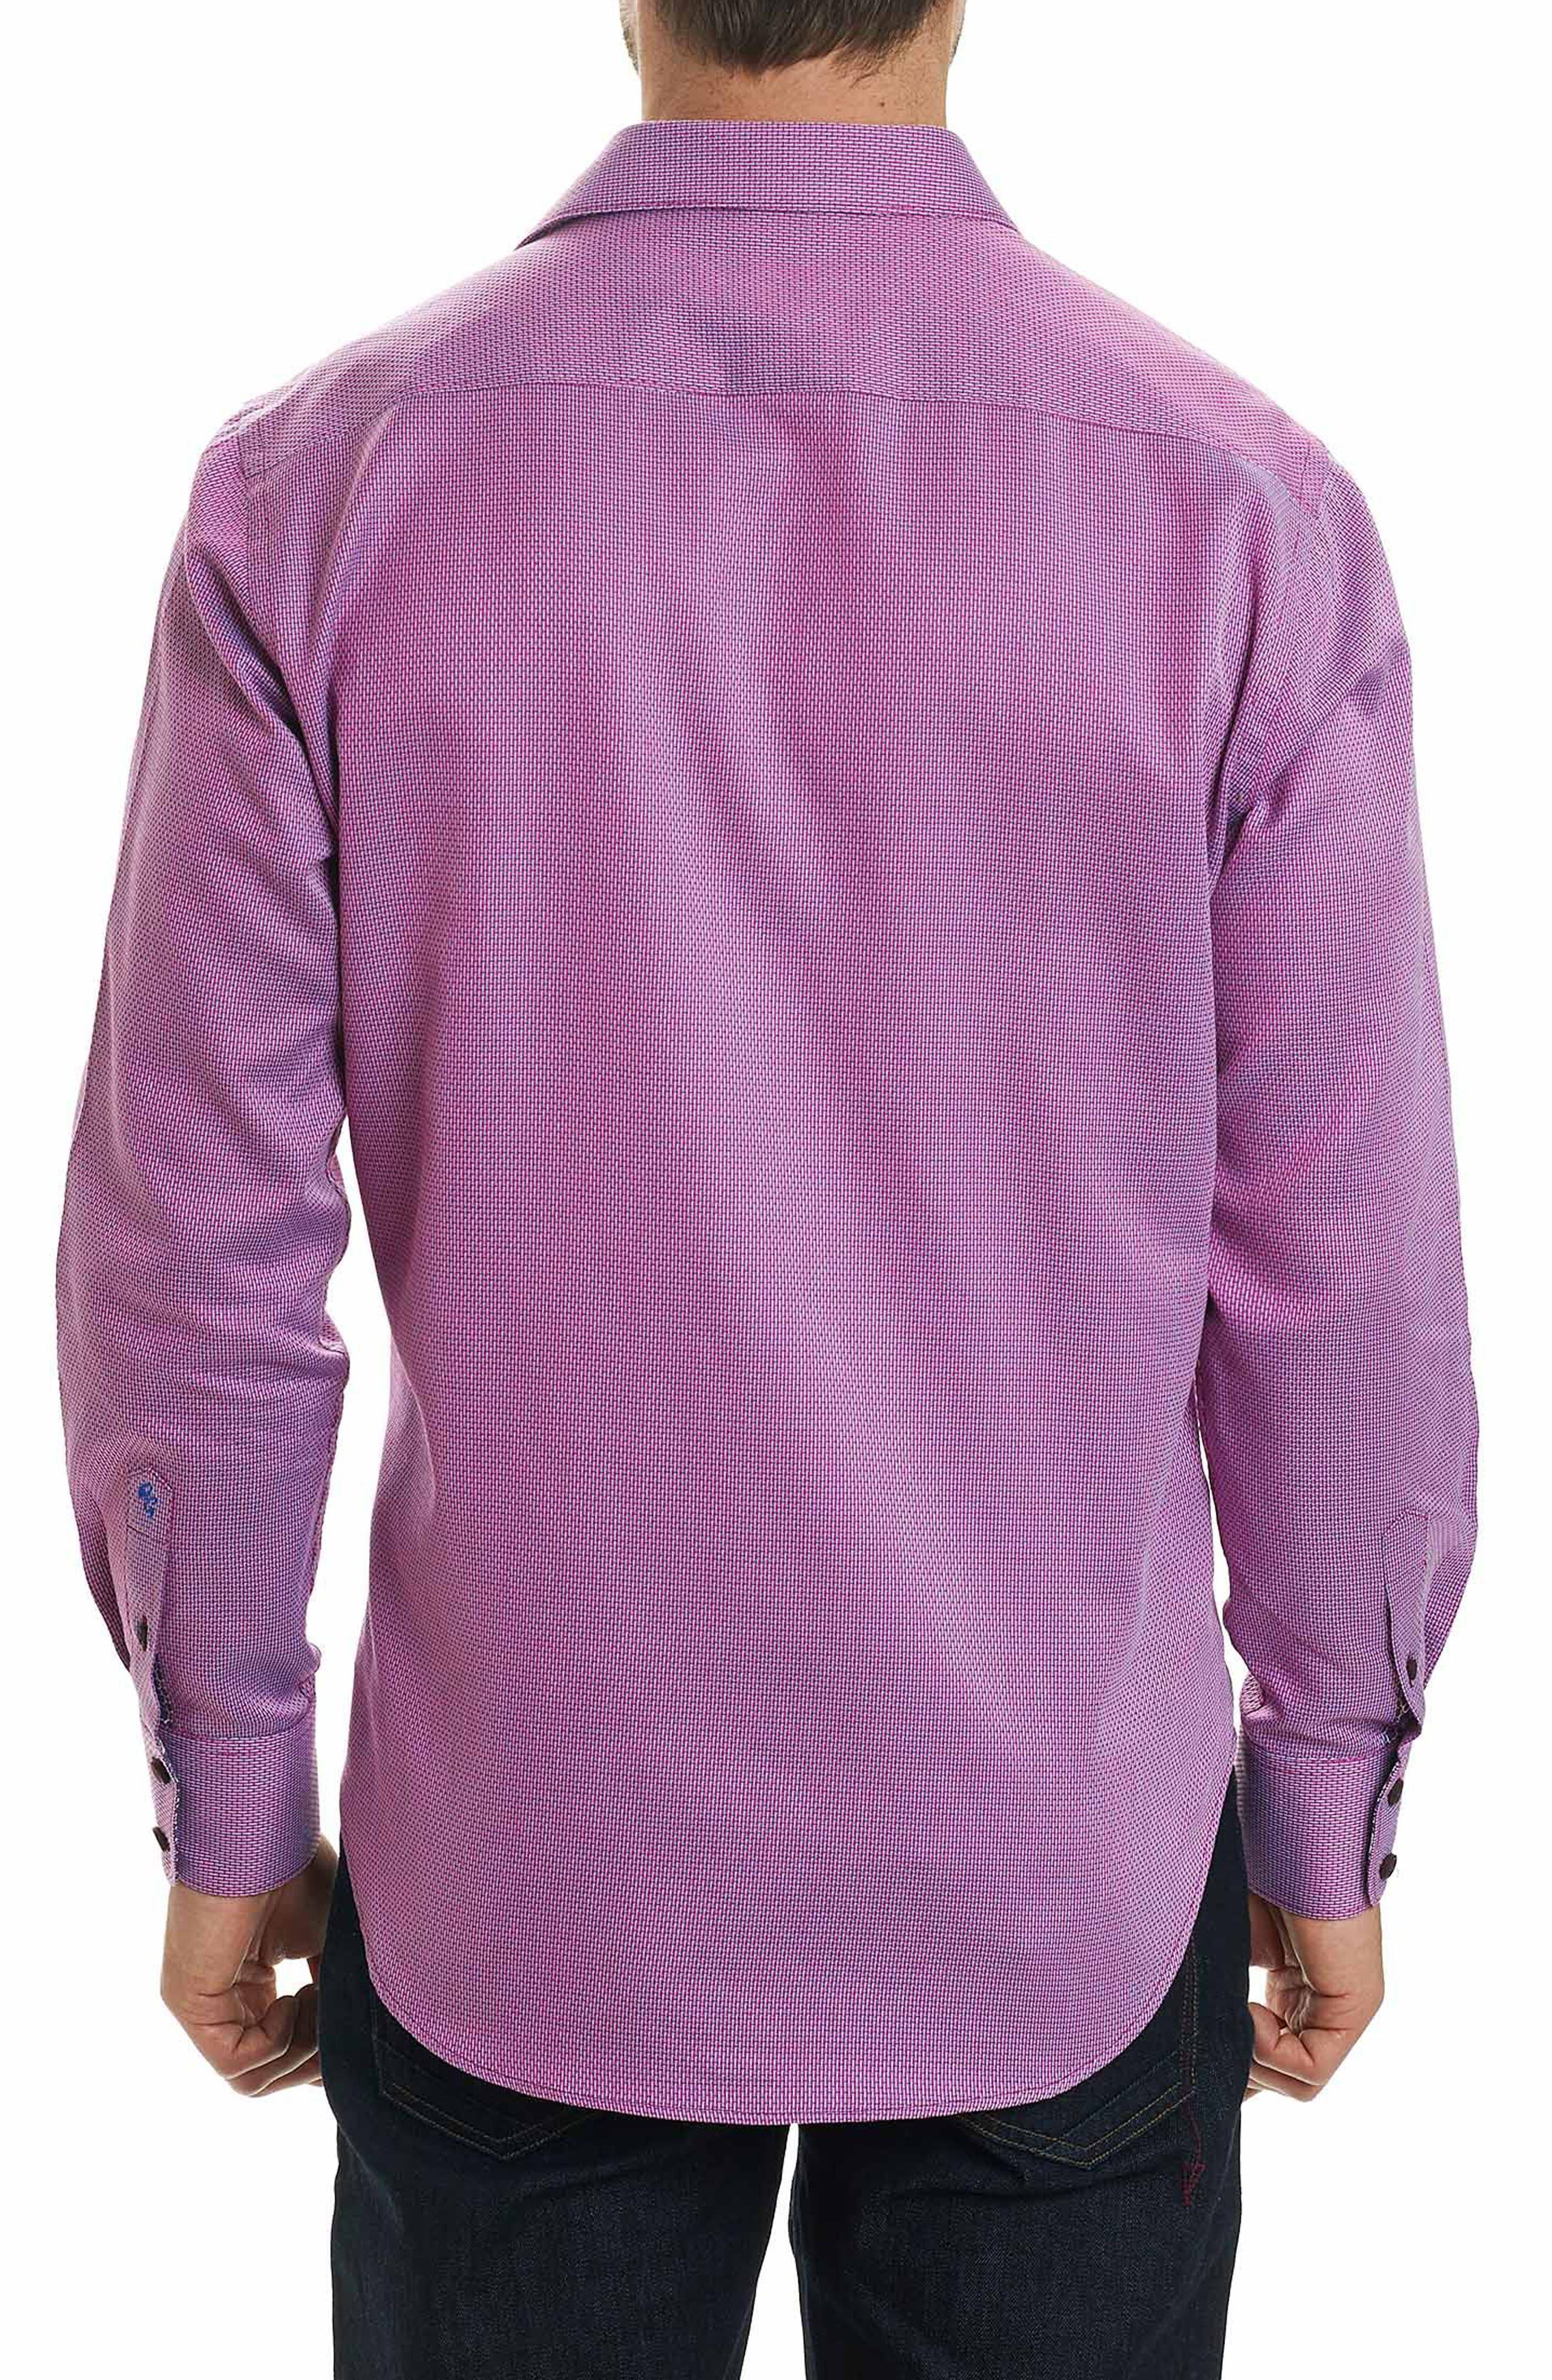 Jobson Regular Fit Sport Shirt,                             Alternate thumbnail 2, color,                             RASPBERRY